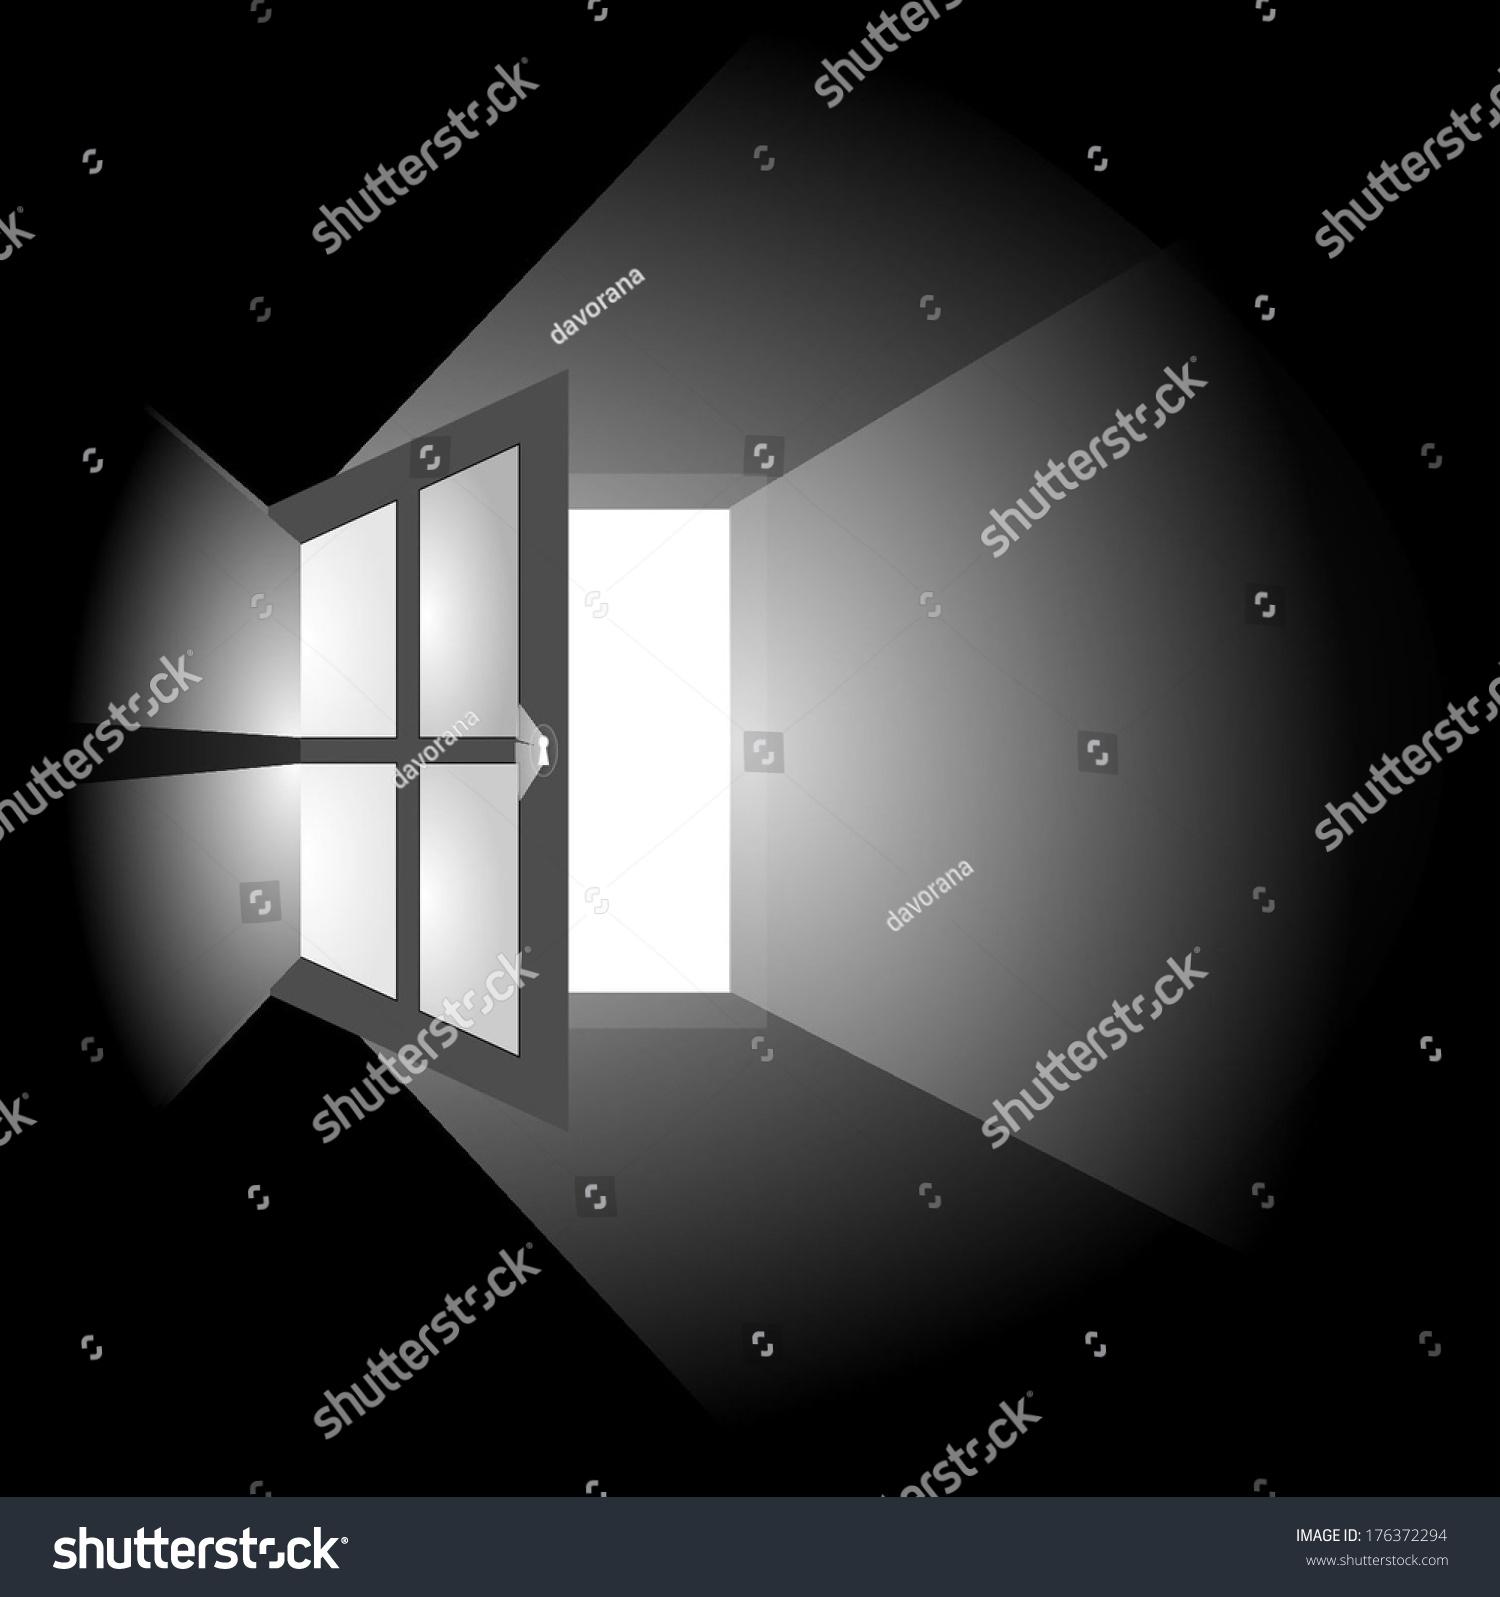 Dark room with light through window - Open Window In A Dark Room Through Which The Rays Of Light Isolated On Black